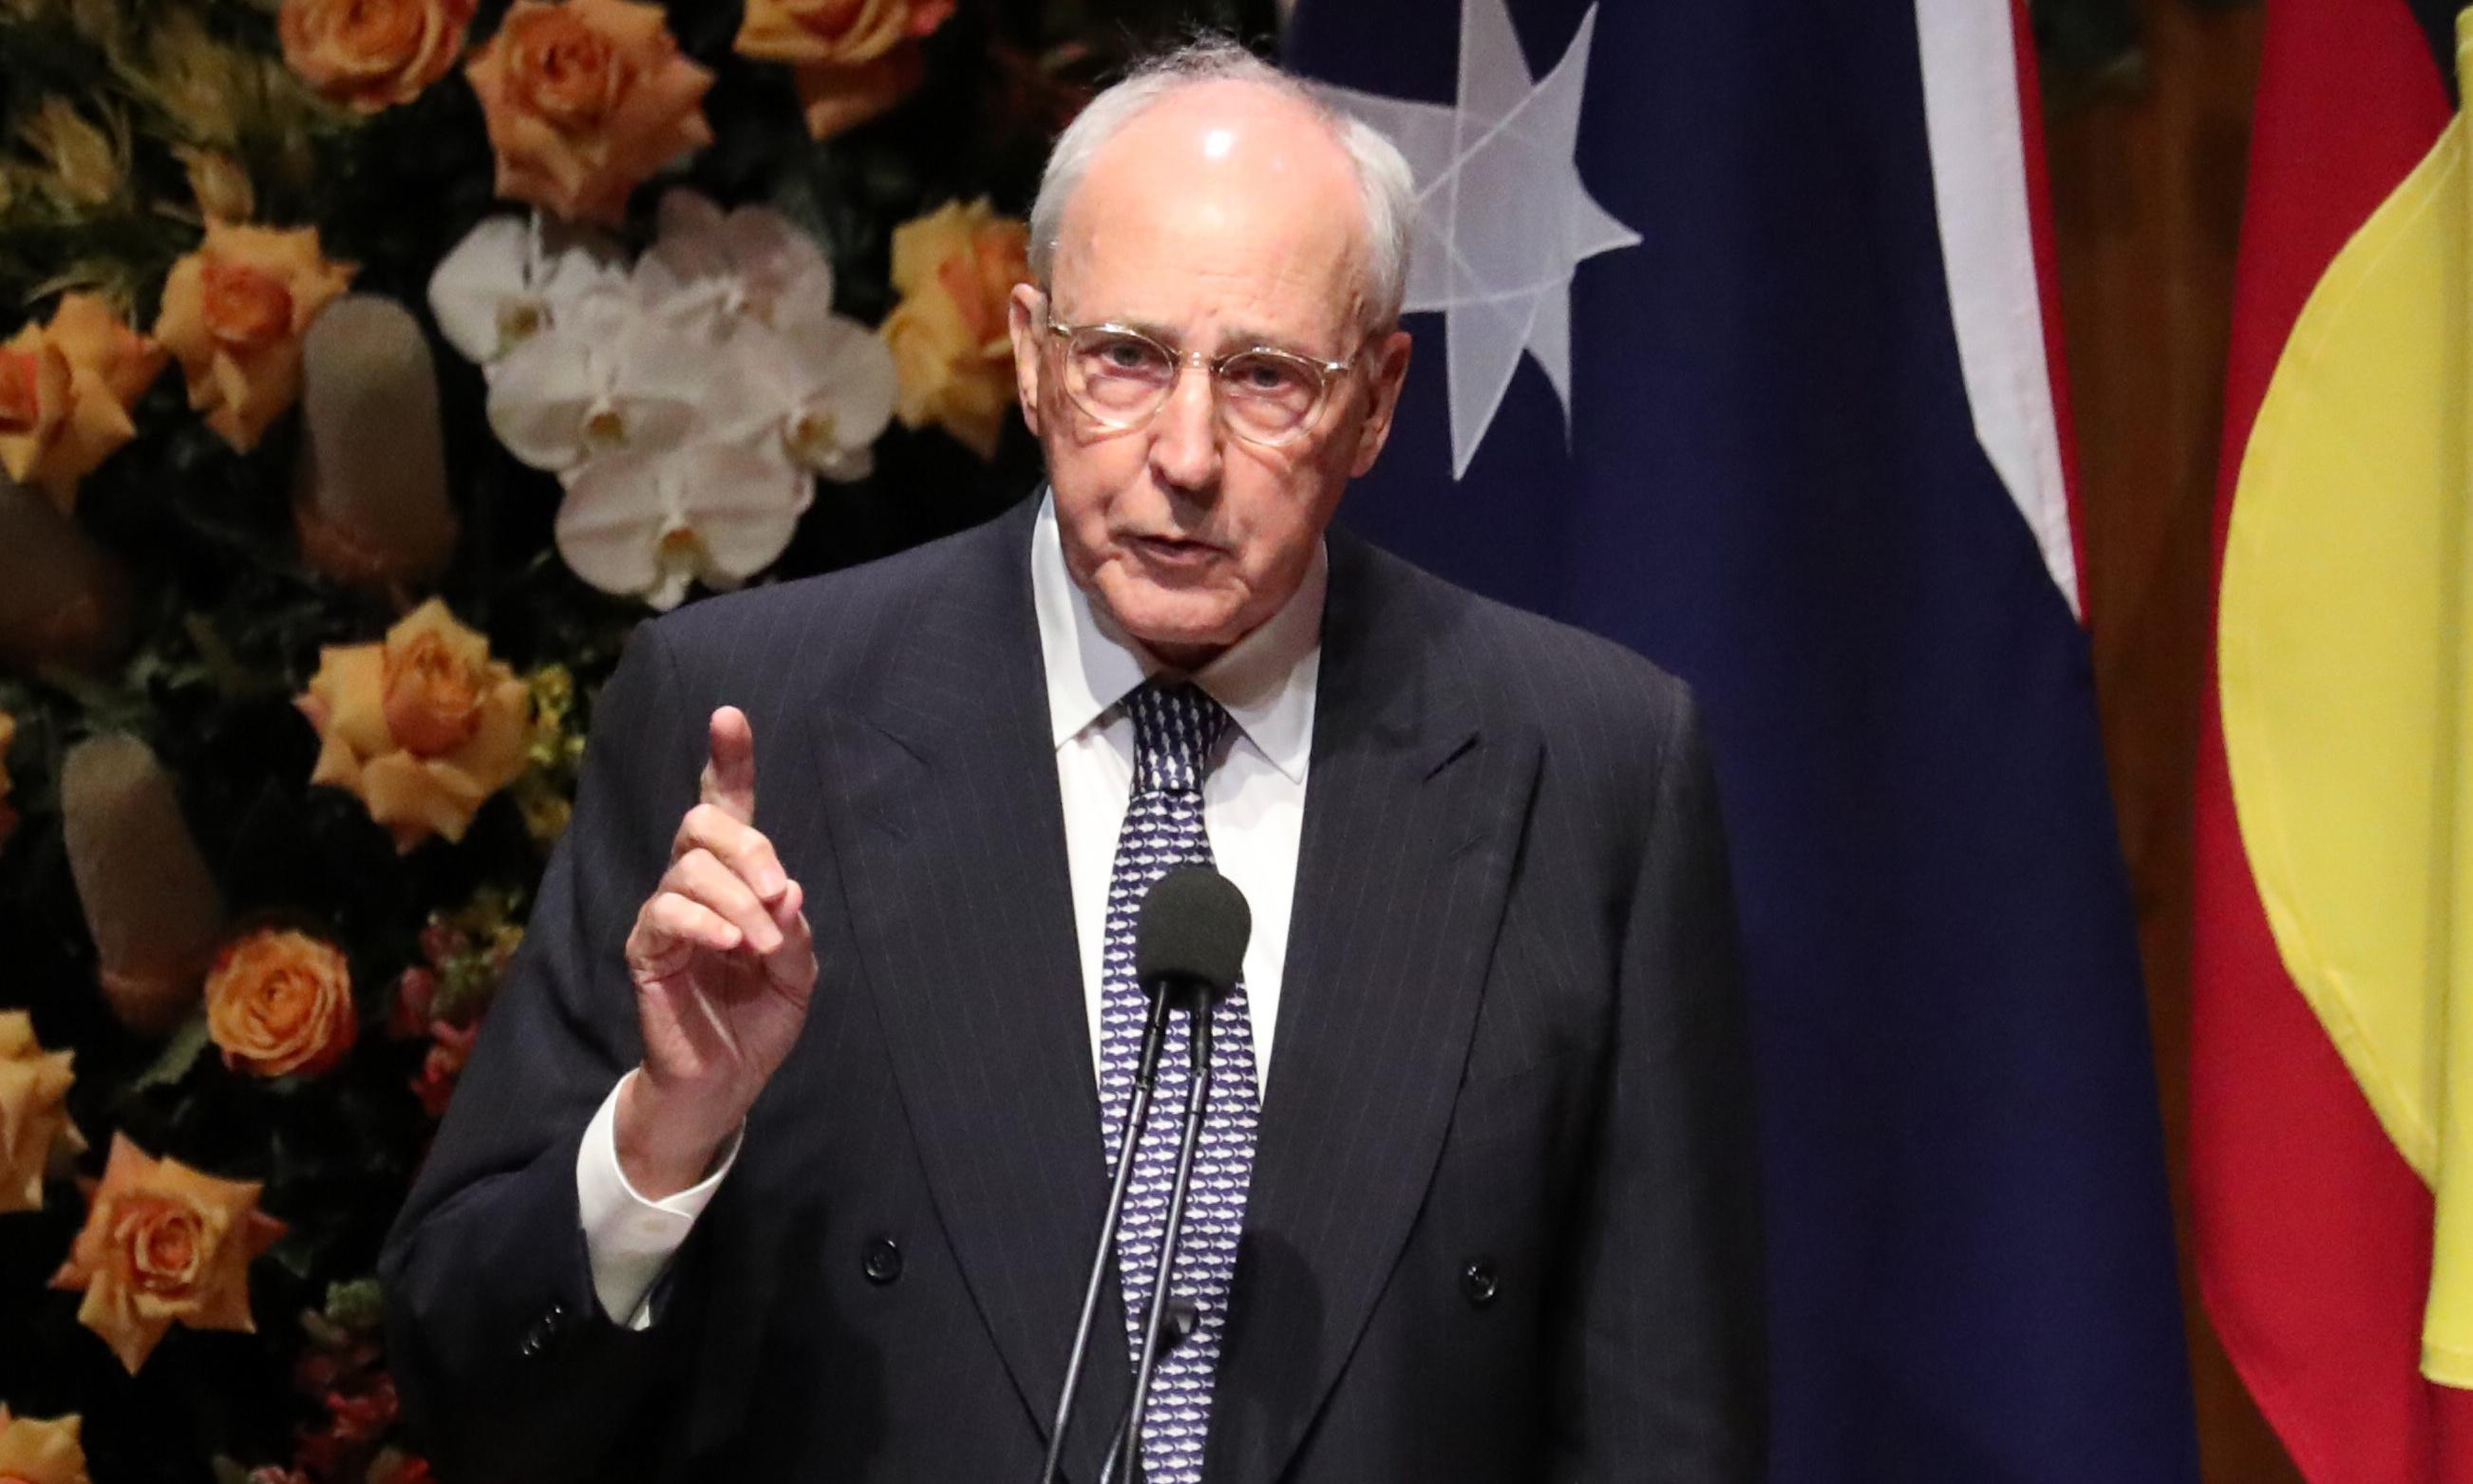 Paul Keating lambasts Australia's security agencies and 'pious' media for anti-China rhetoric